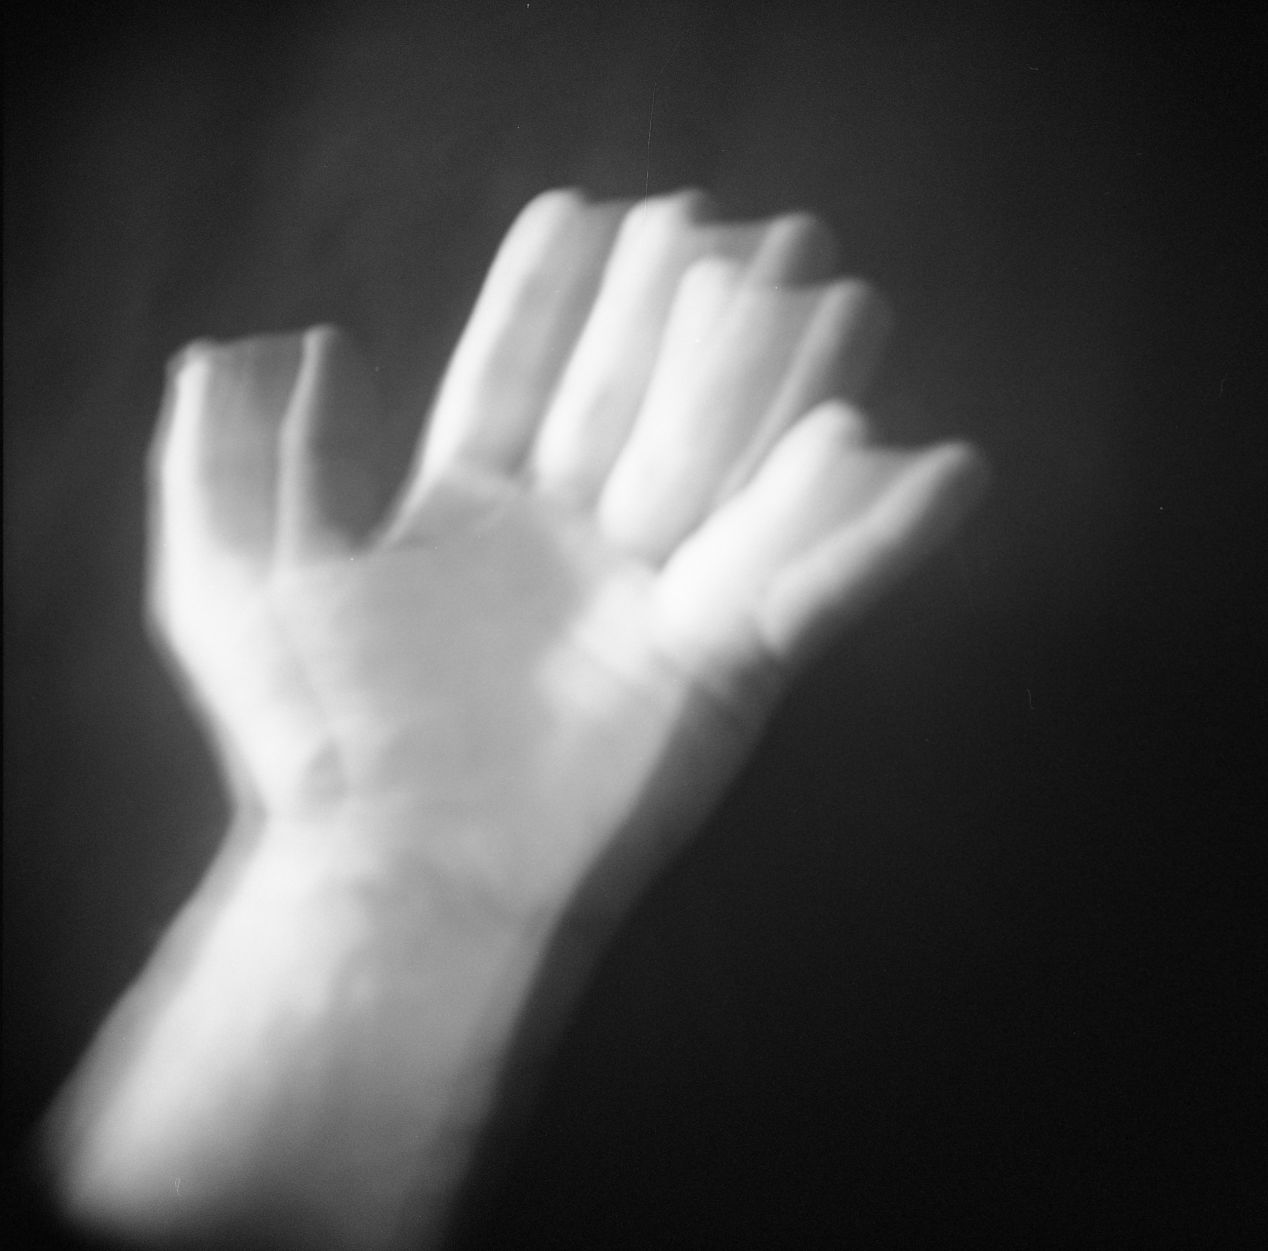 My Hand, Double exposure, ILFORD 400, Holga 120GFN